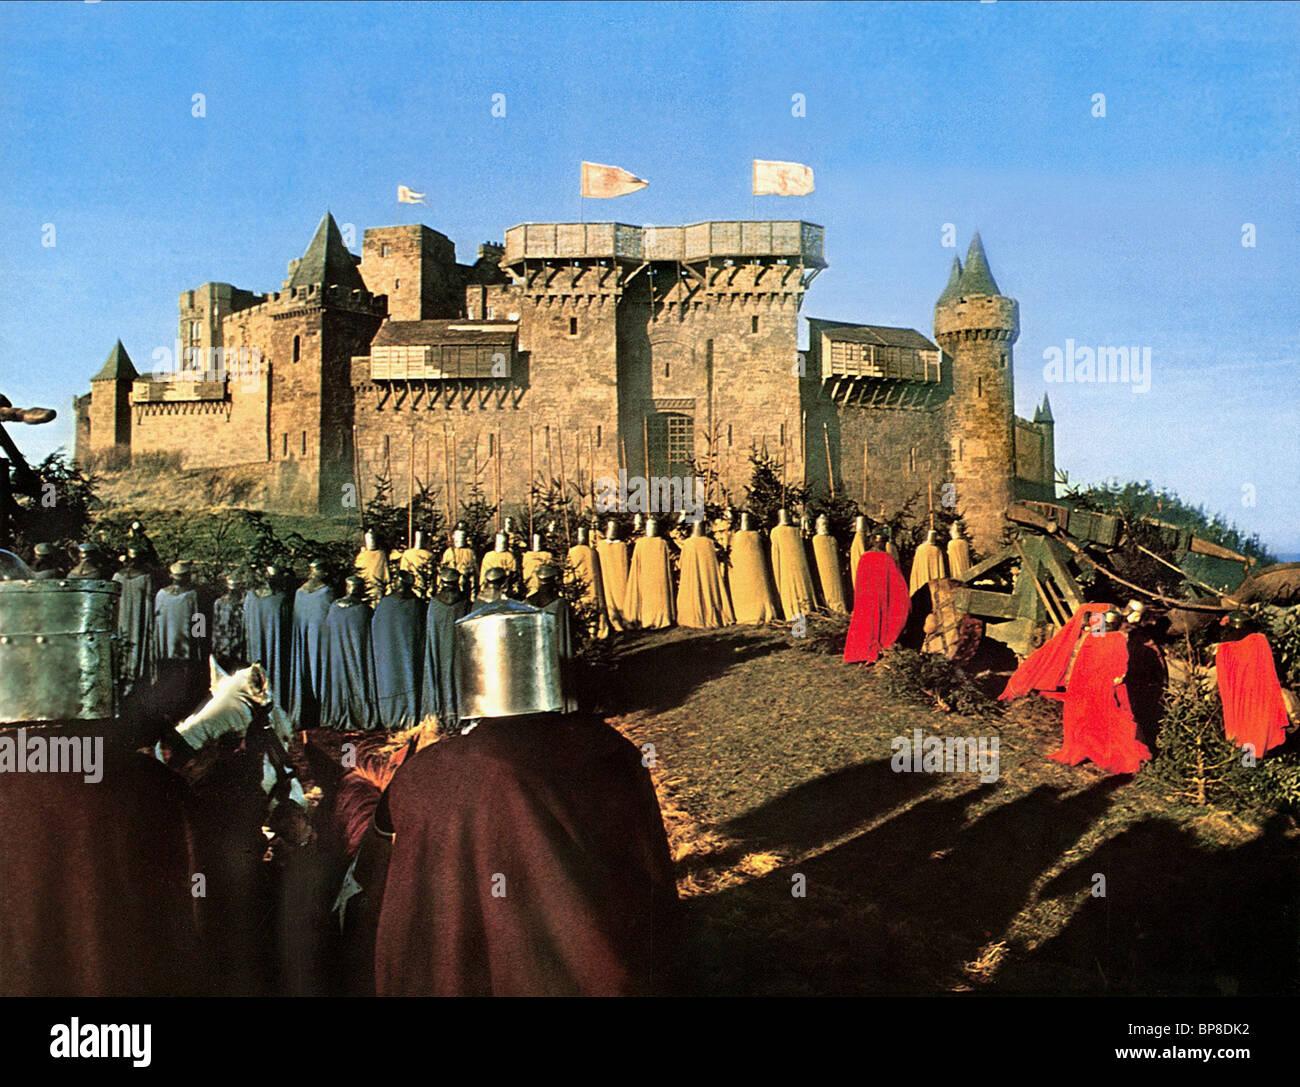 SIEGE SCENE MACBETH (1971) - Stock Image